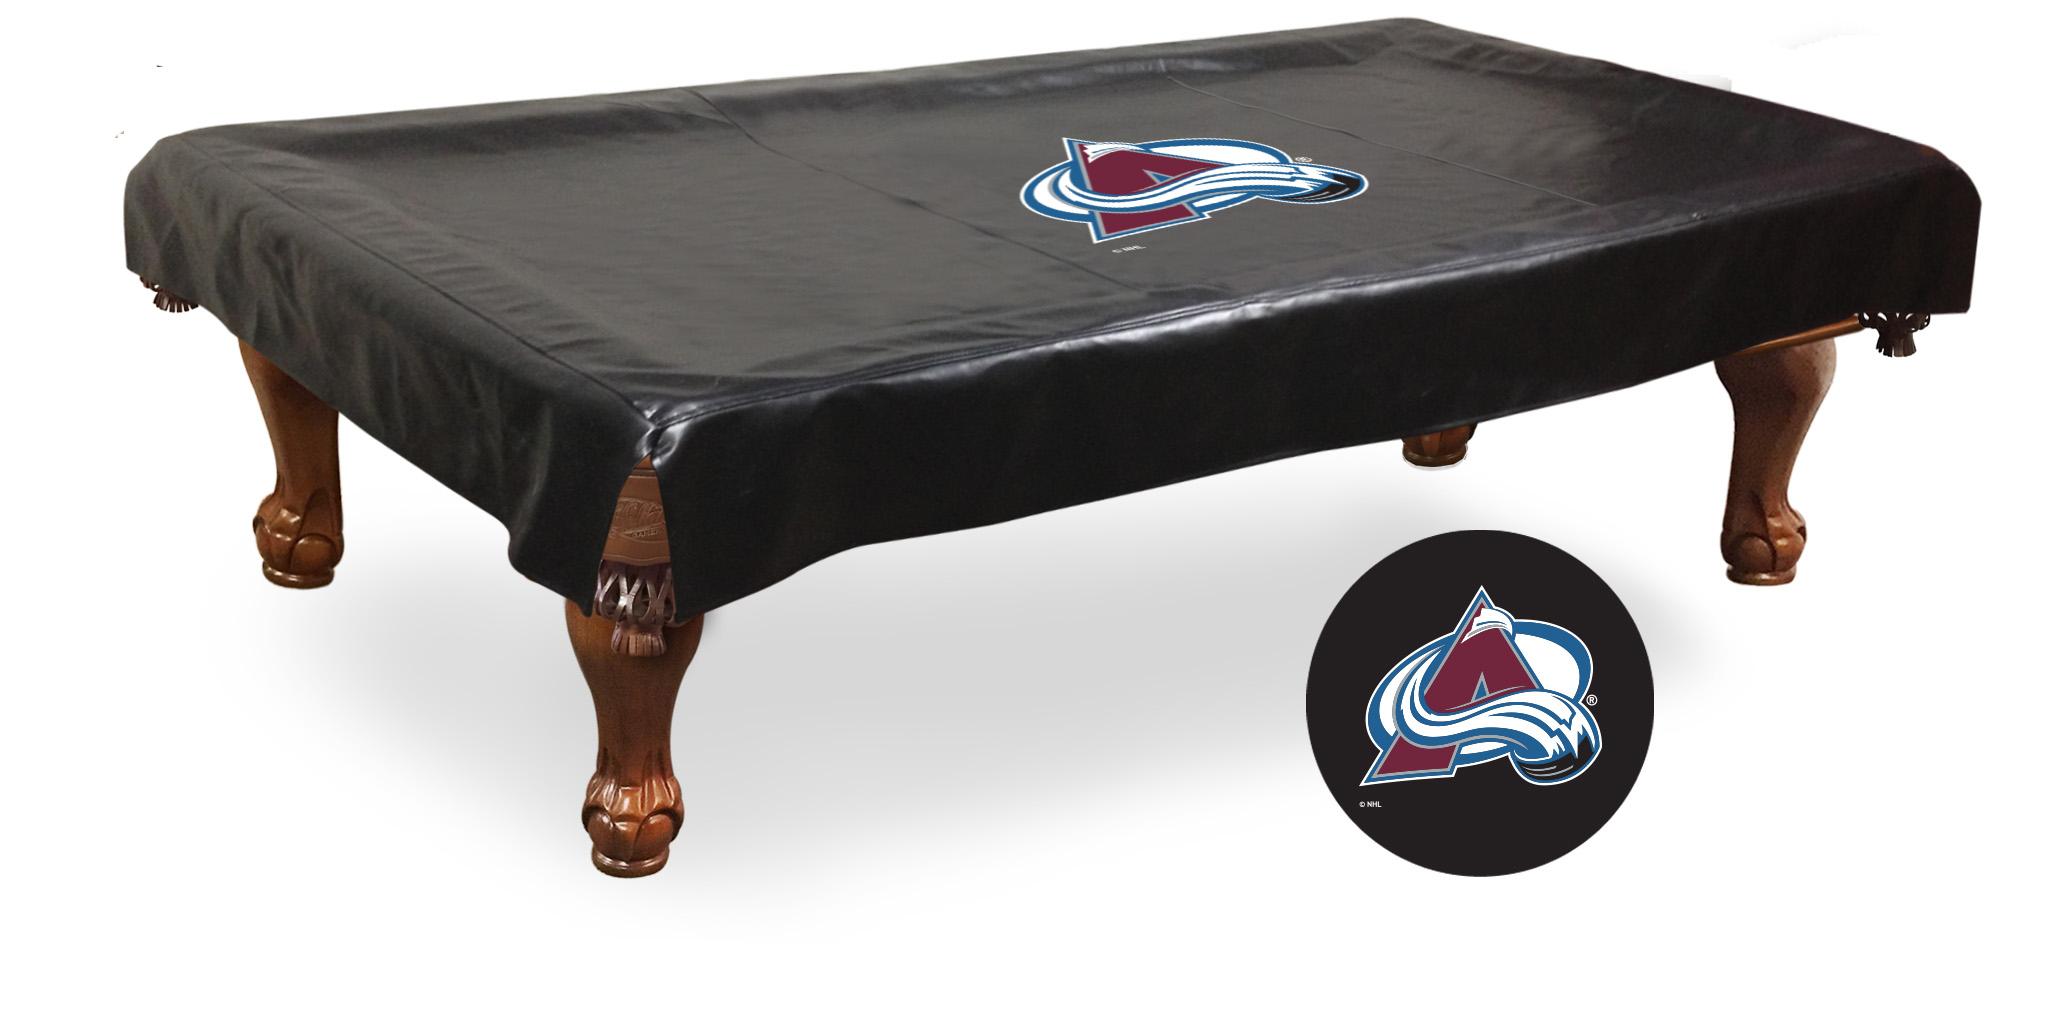 Colorado Avalanche Hbs Black Vinyl Billiard Pool Table Cover Ebay